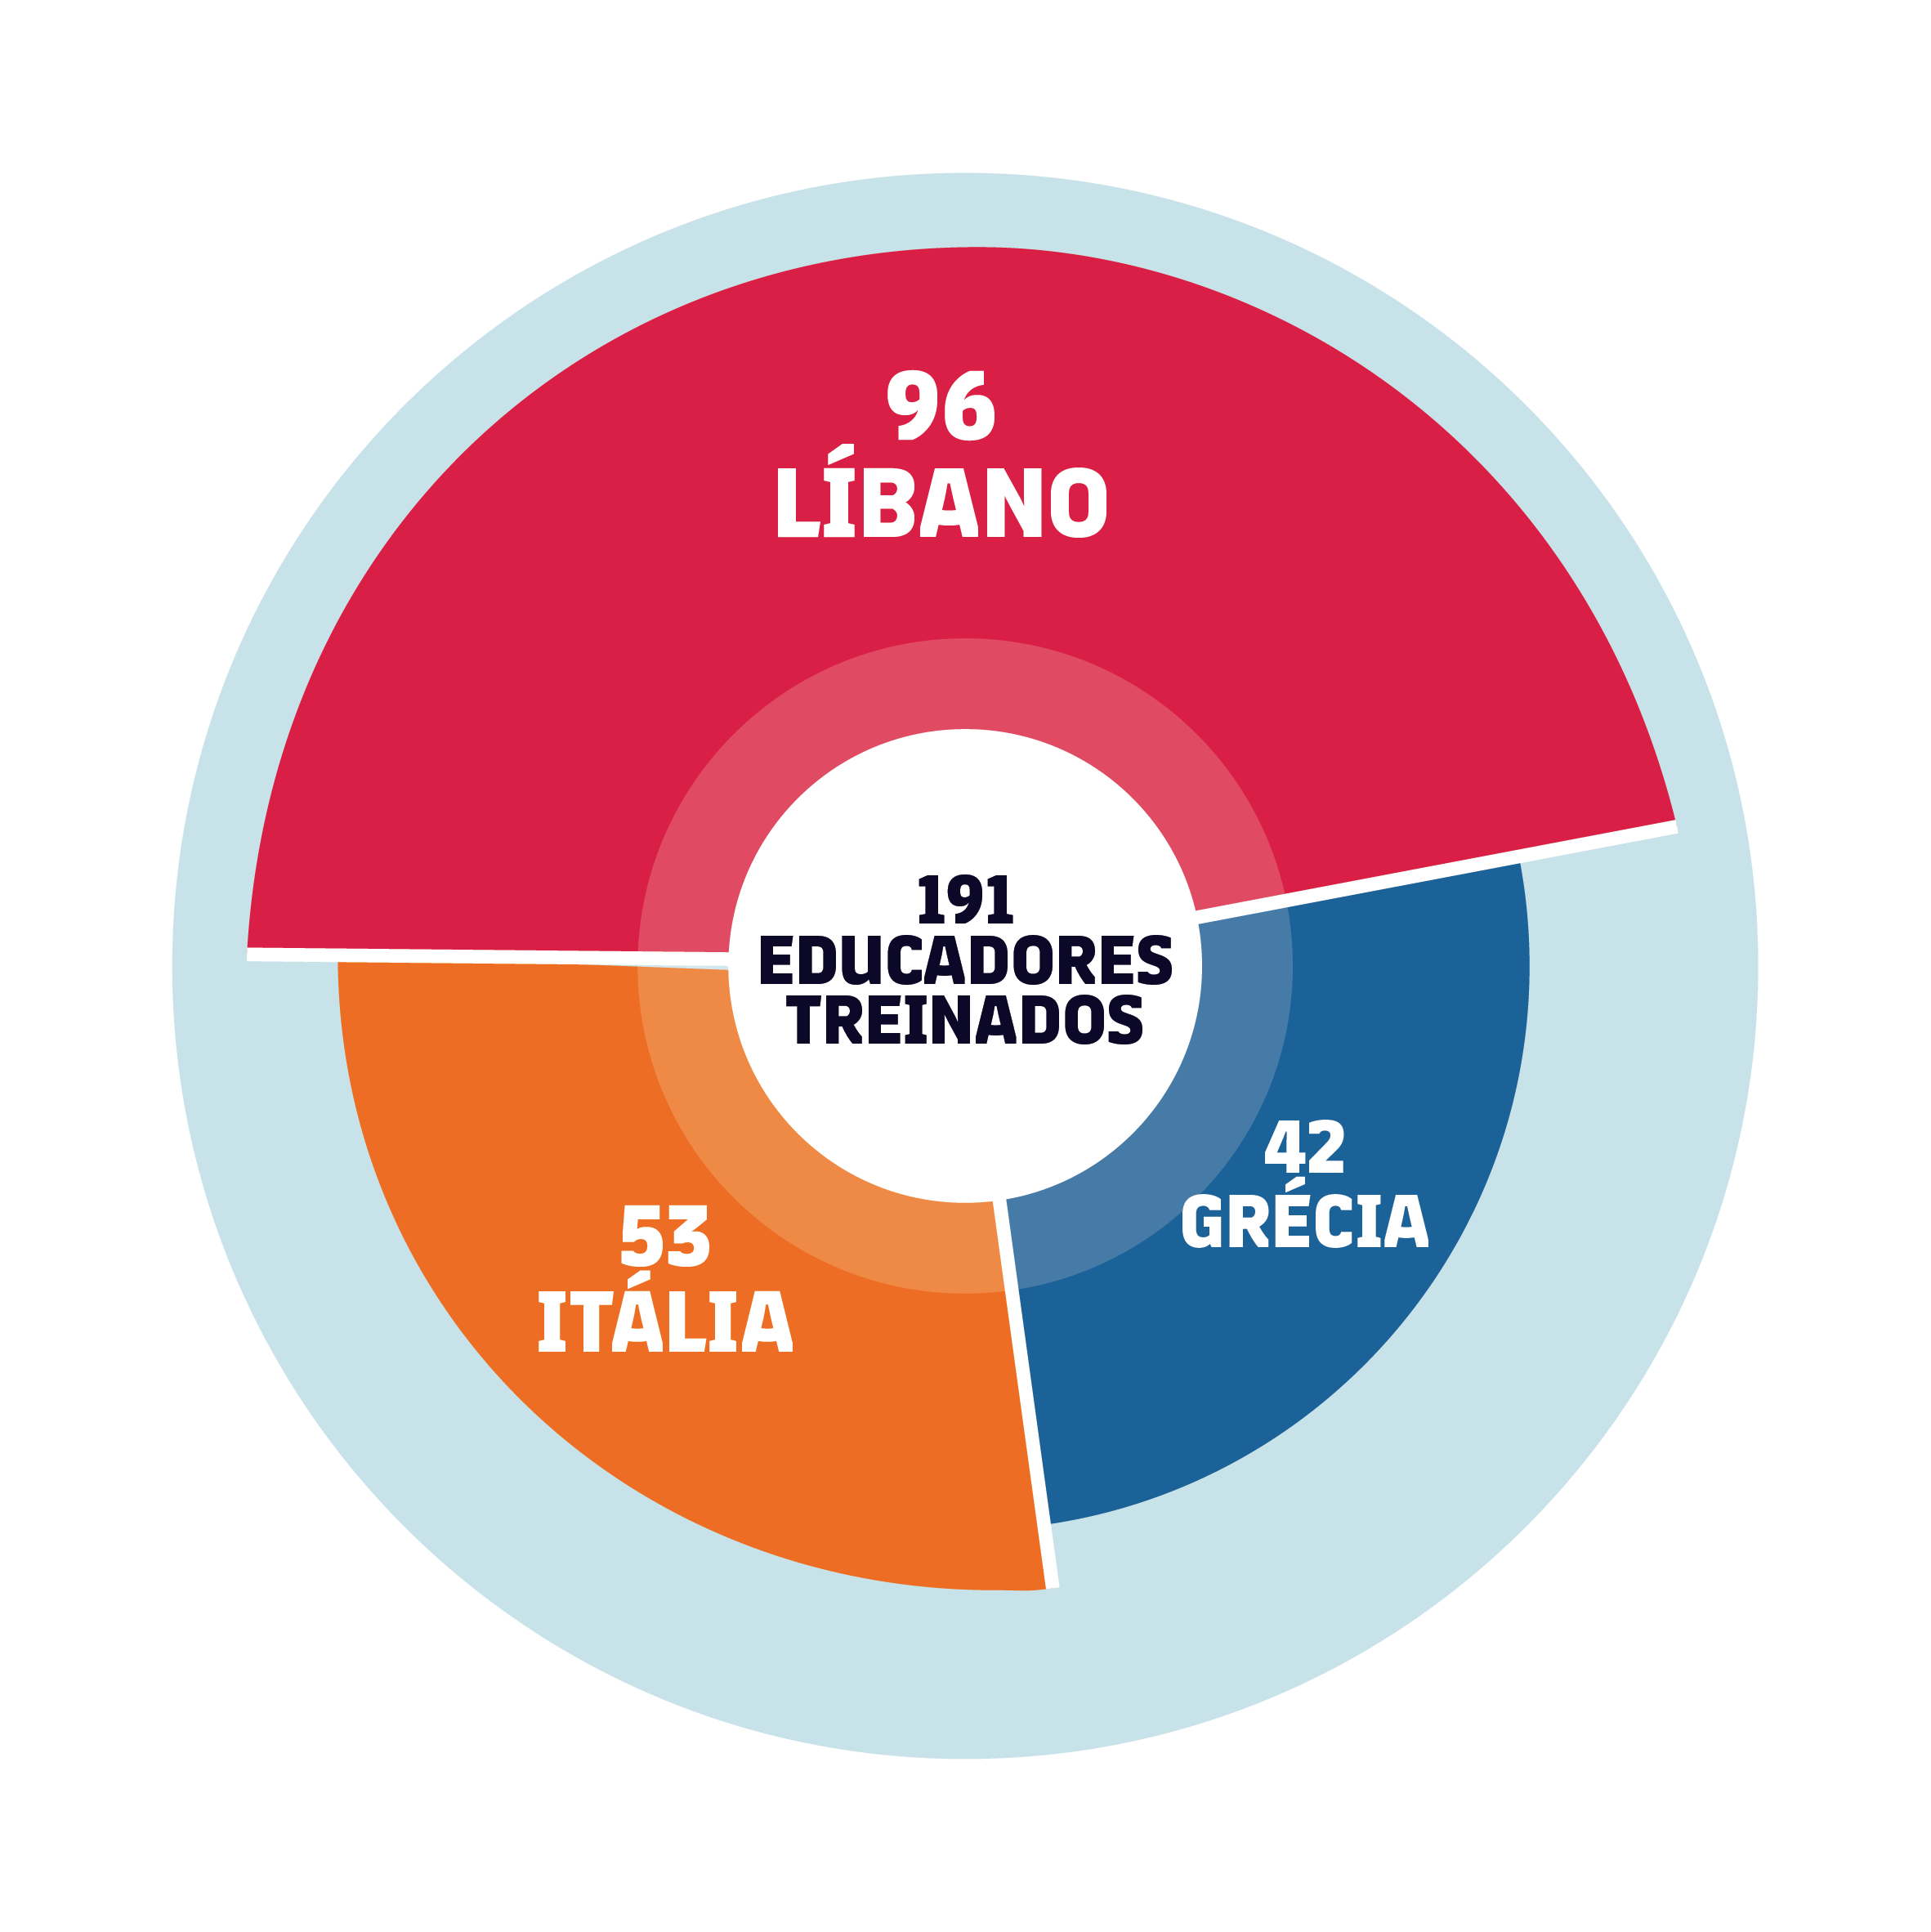 Total 191 educadores formados: 53 Itália, 96 Líbano, 42 Grécia